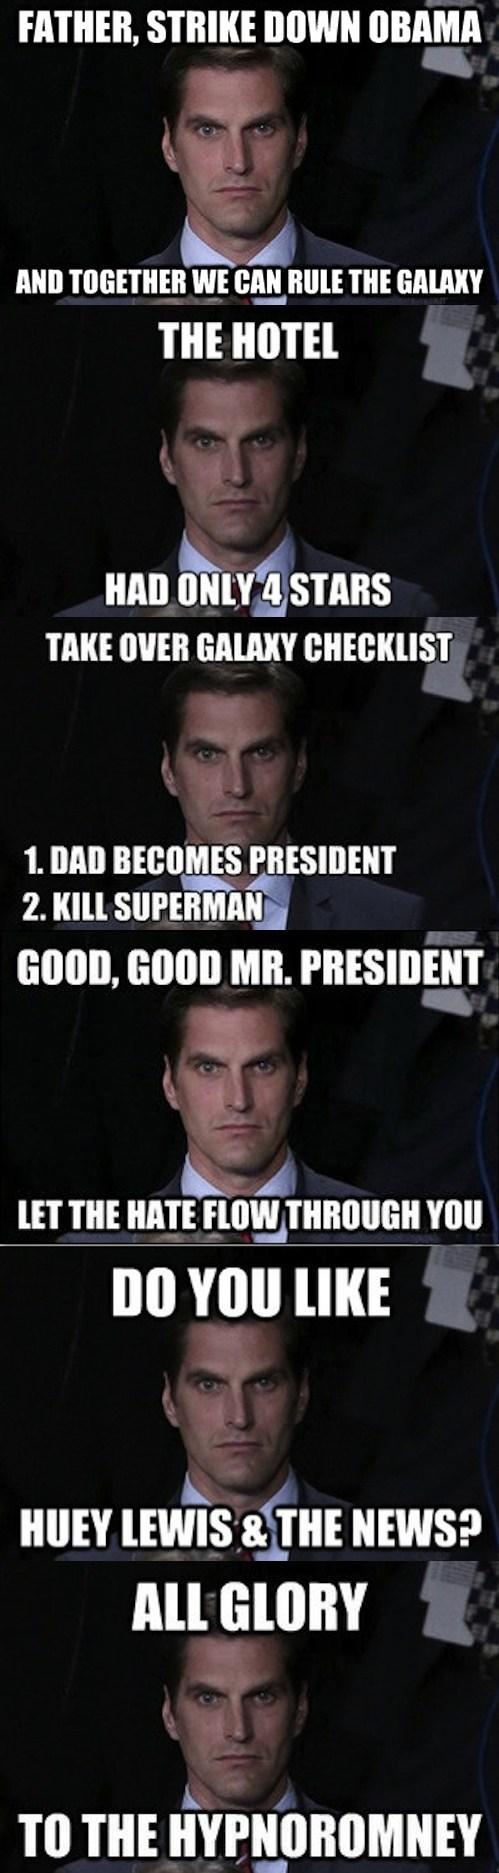 Josh Romney,obama,debate,menacing Josh Romney,meme,american psycho